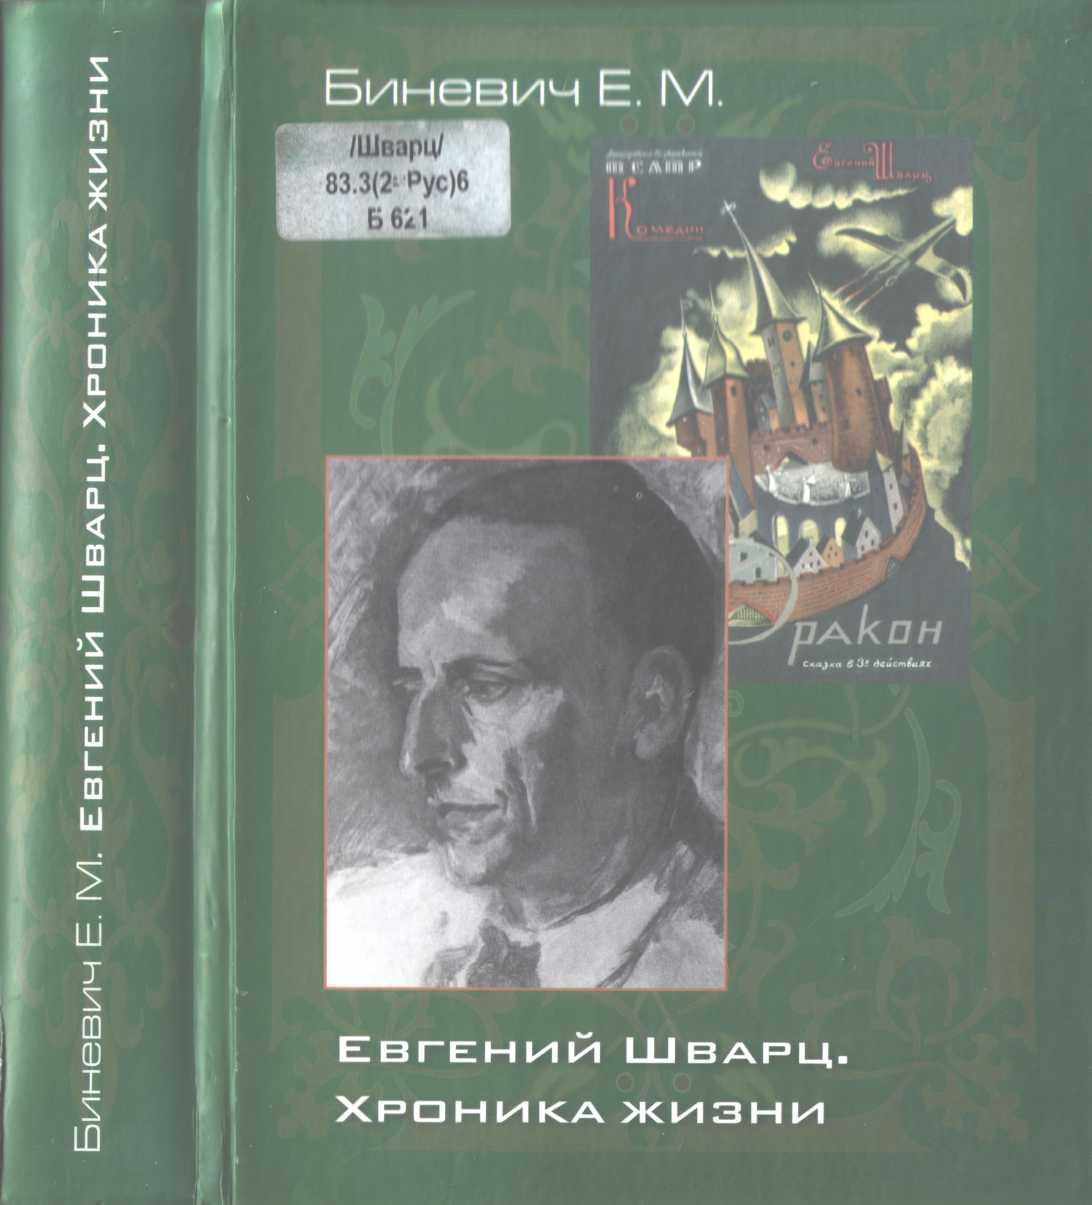 Евгений Биневич: Евгений Шварц. Хроника жизни